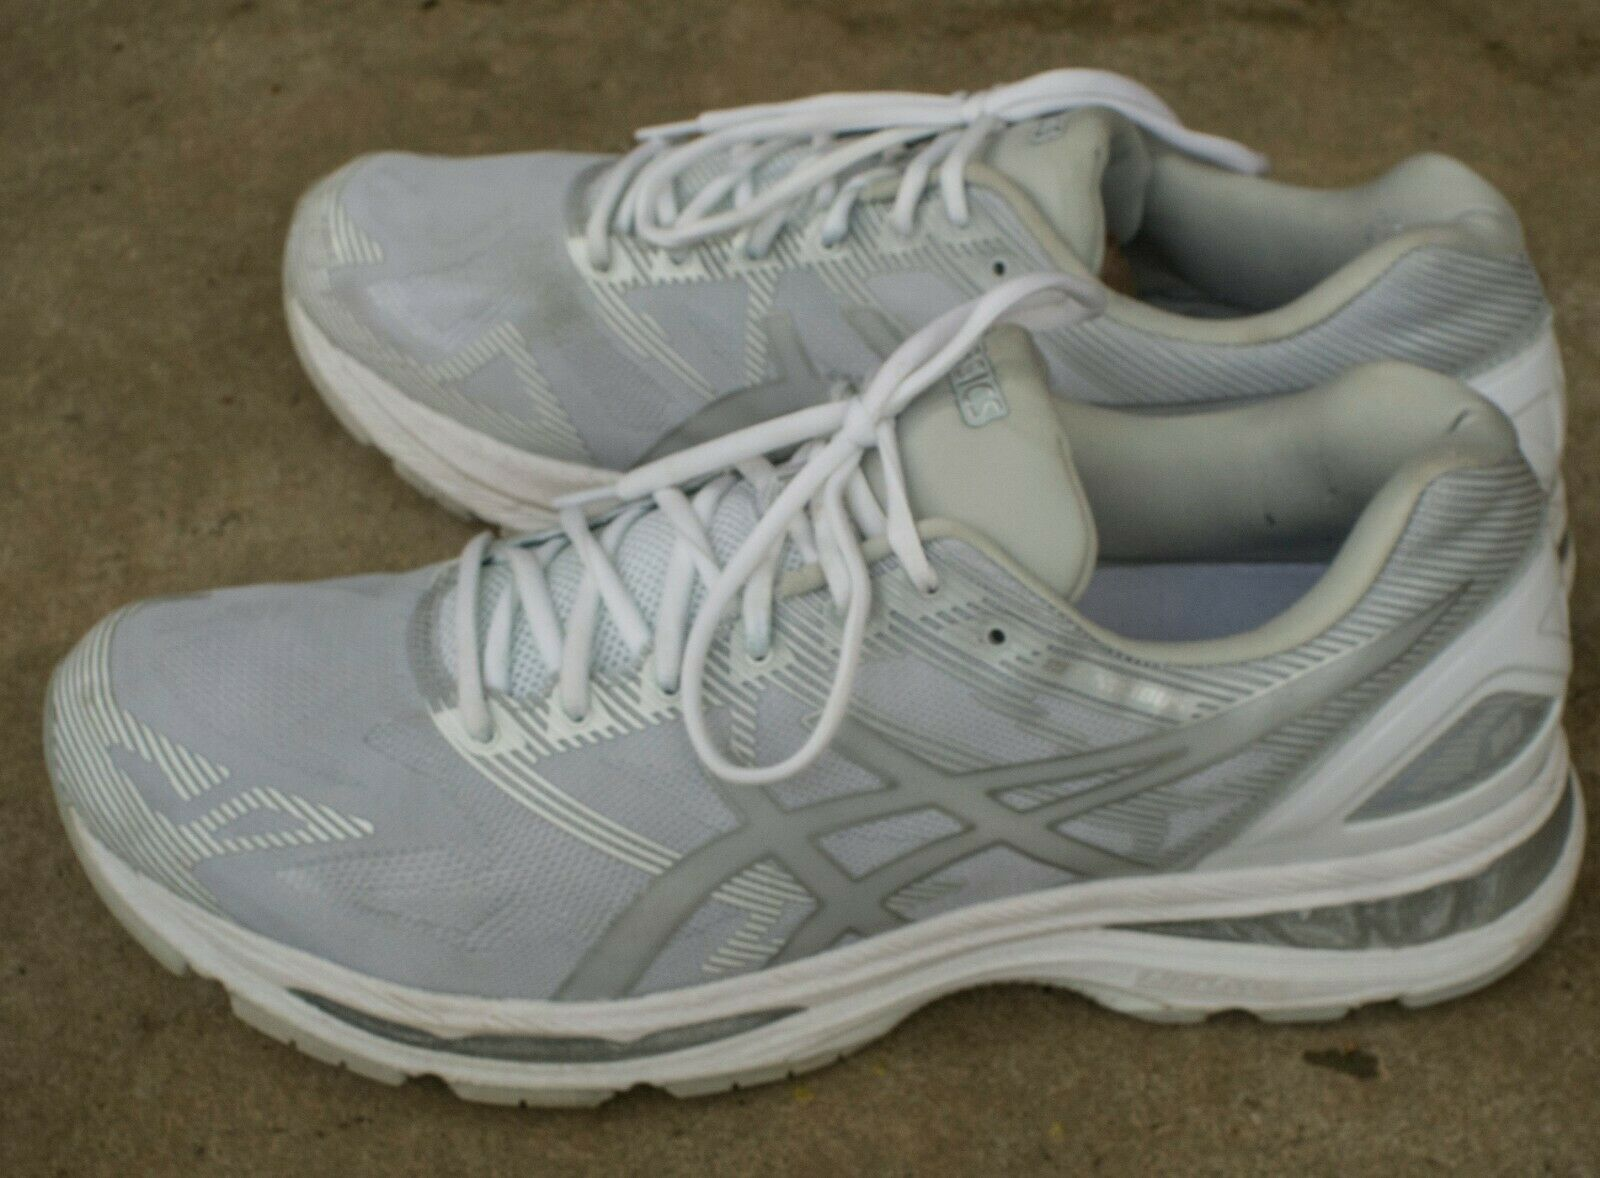 Asics Gel Nimbus 19 tamaño nos 15 M Para hombres Zapatos para Correr gris blancoo T700N